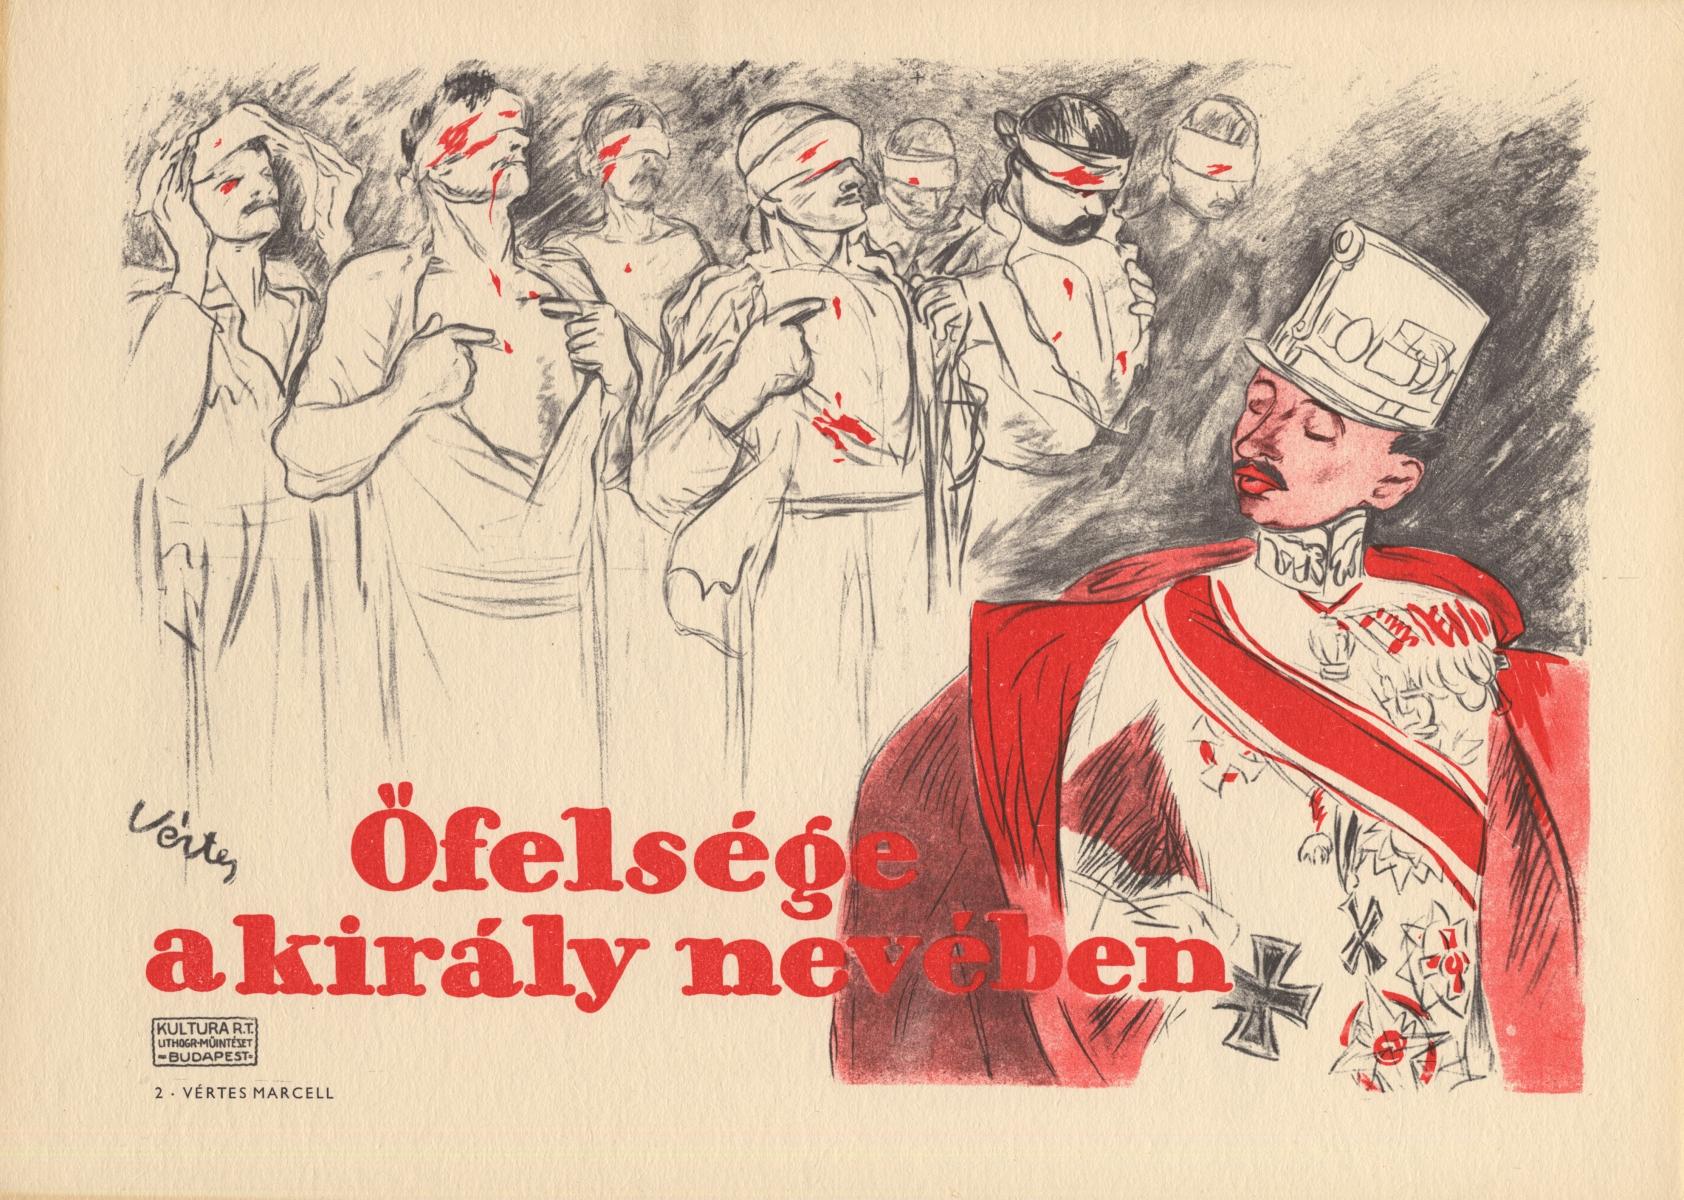 02_02.-Ofelsege_a_kiraly_neveben